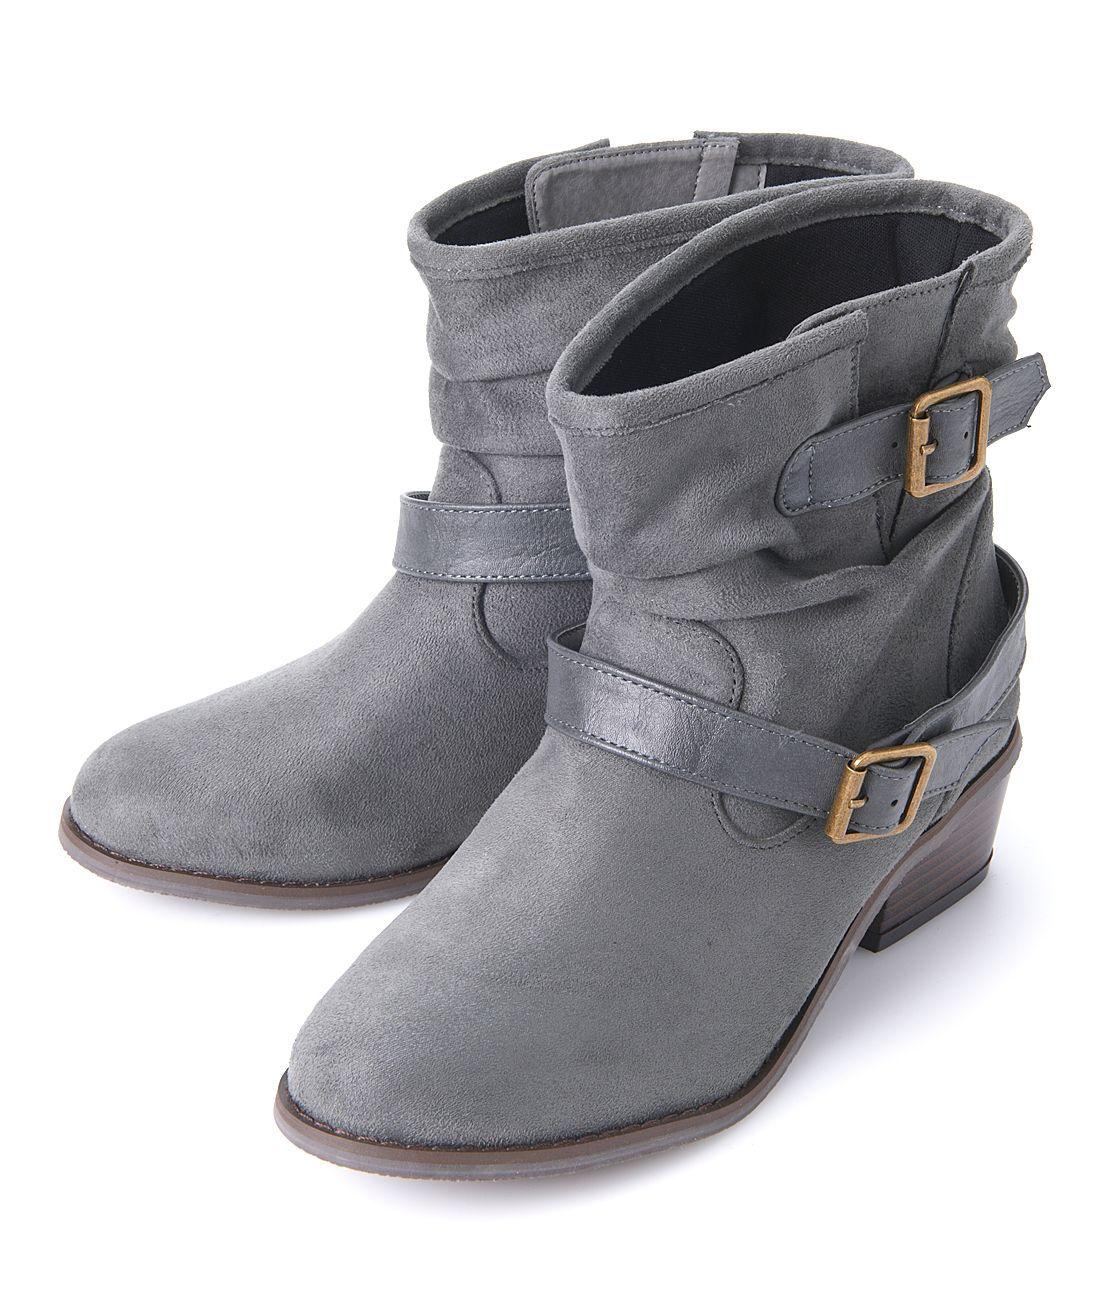 2WAY boots